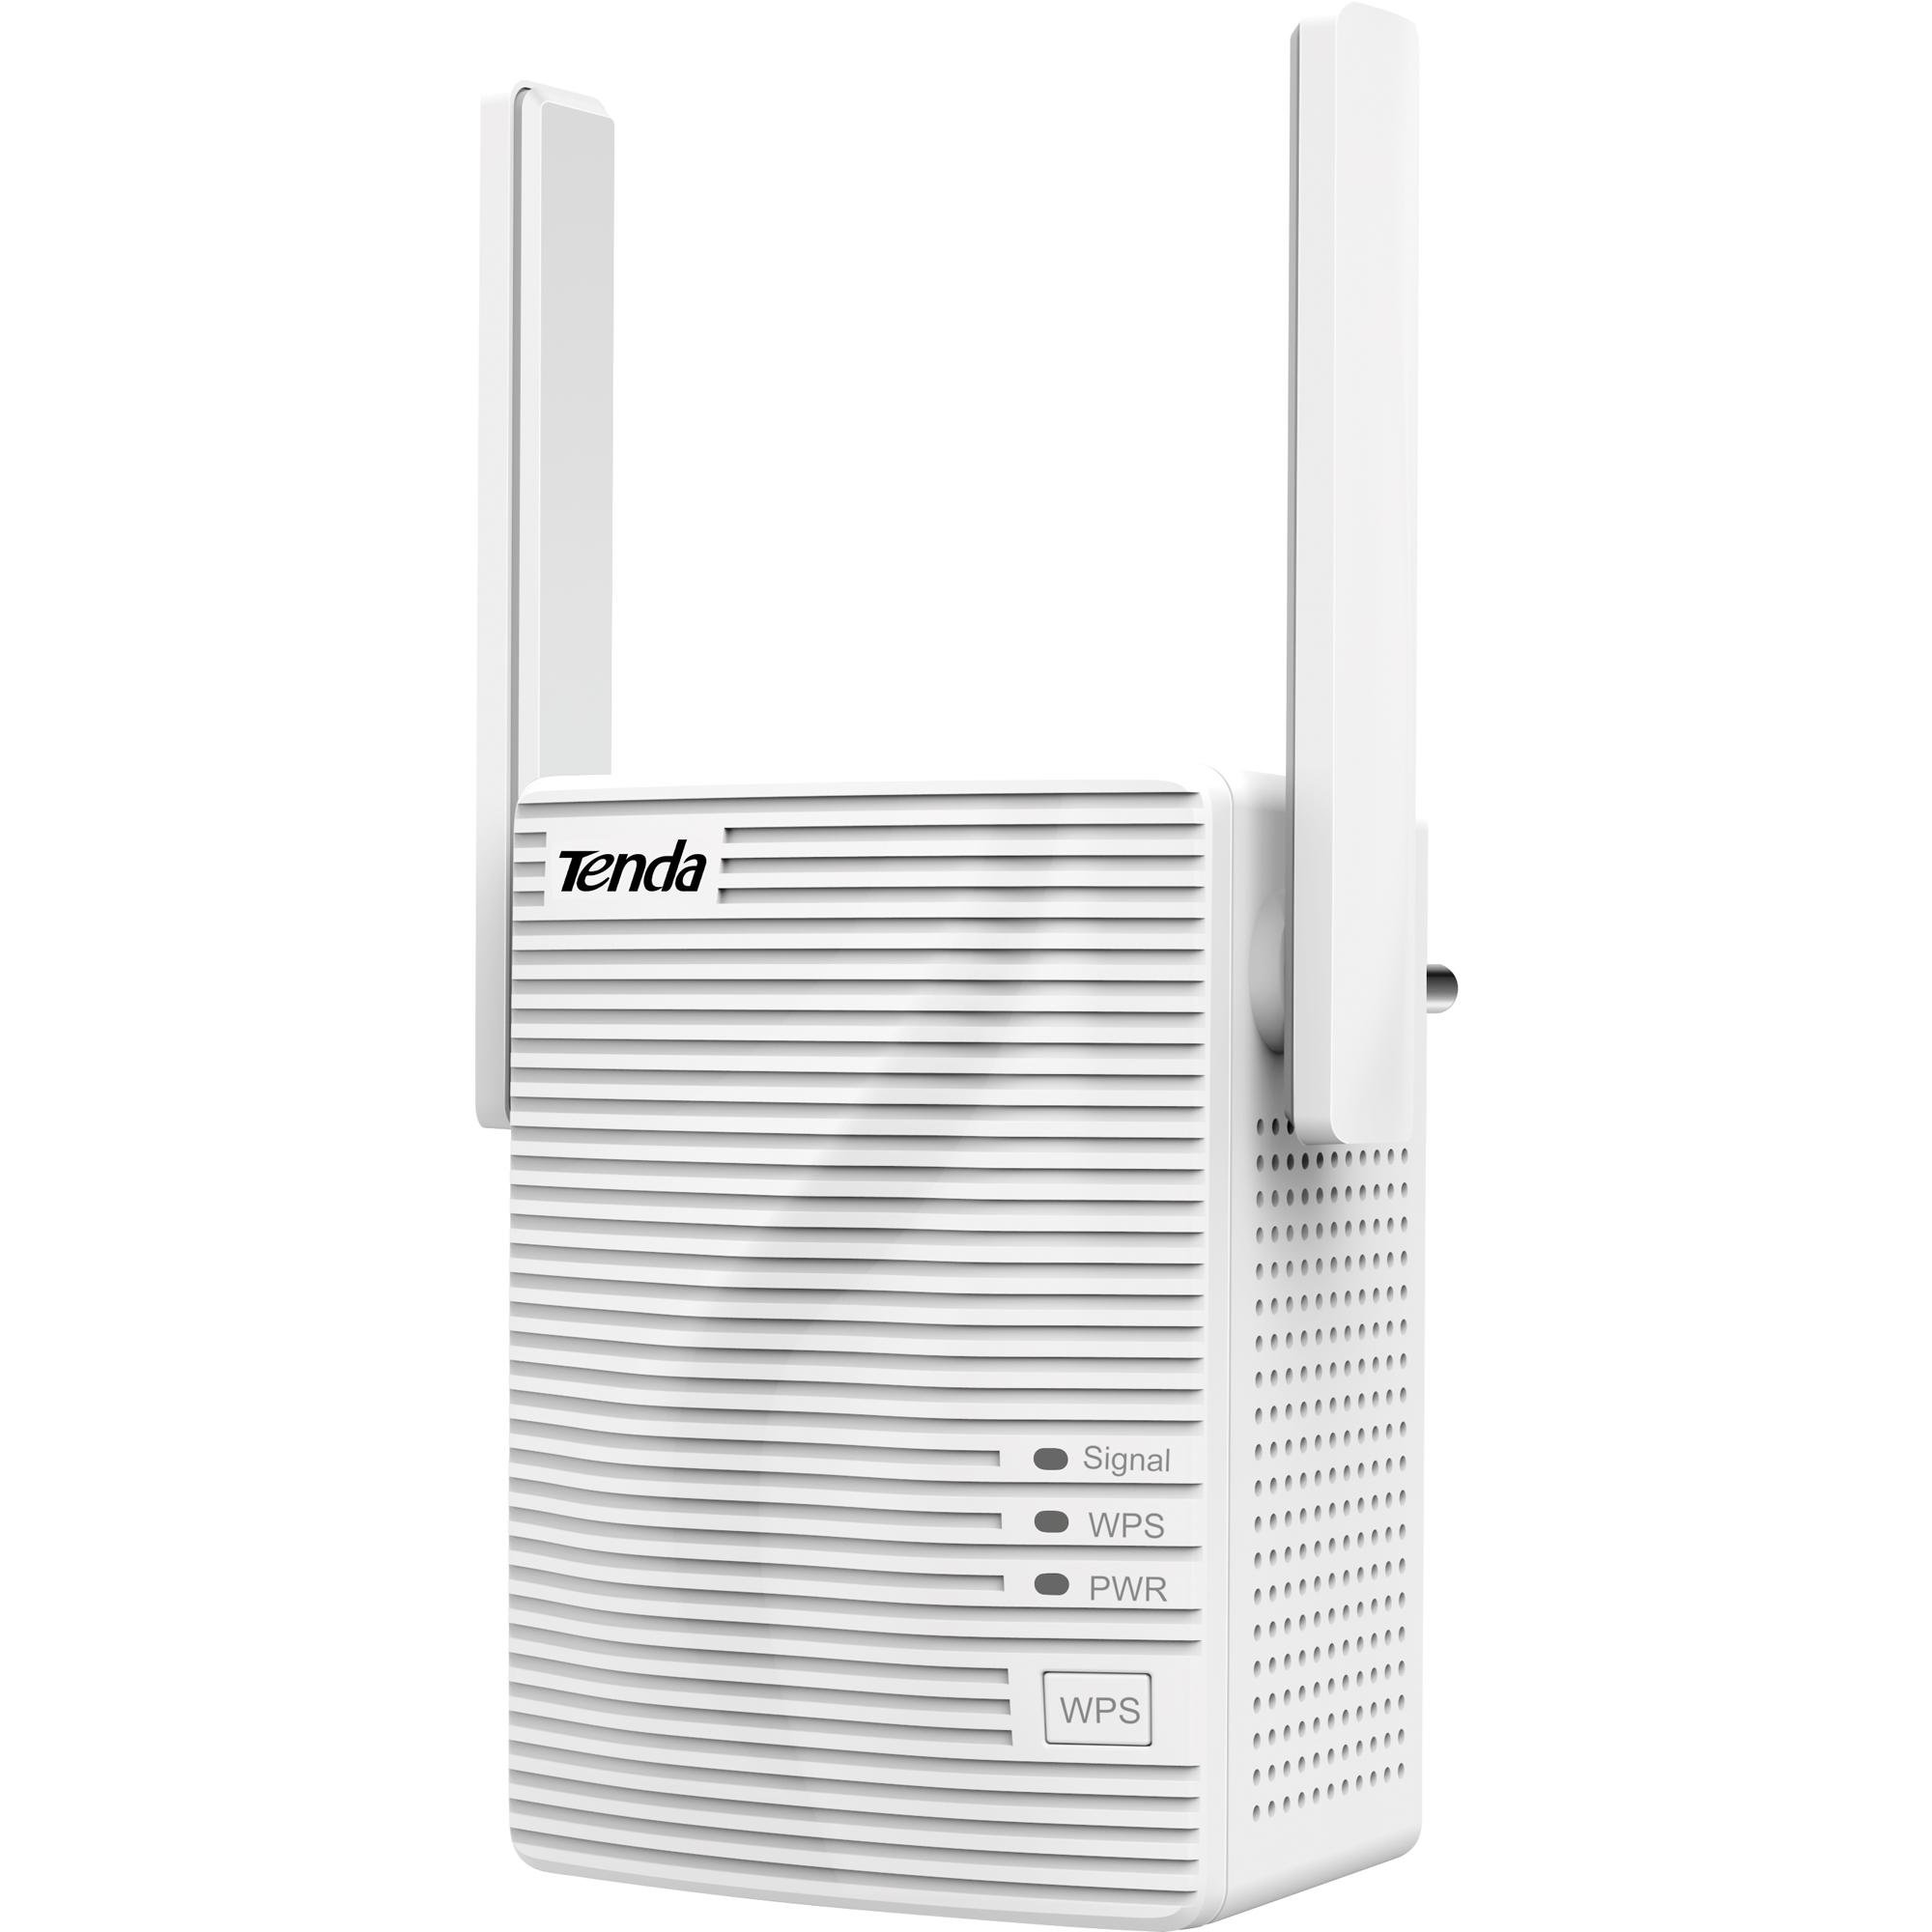 Extensor Wireless 1200Mbps Dual Band A18 Branco TENDA